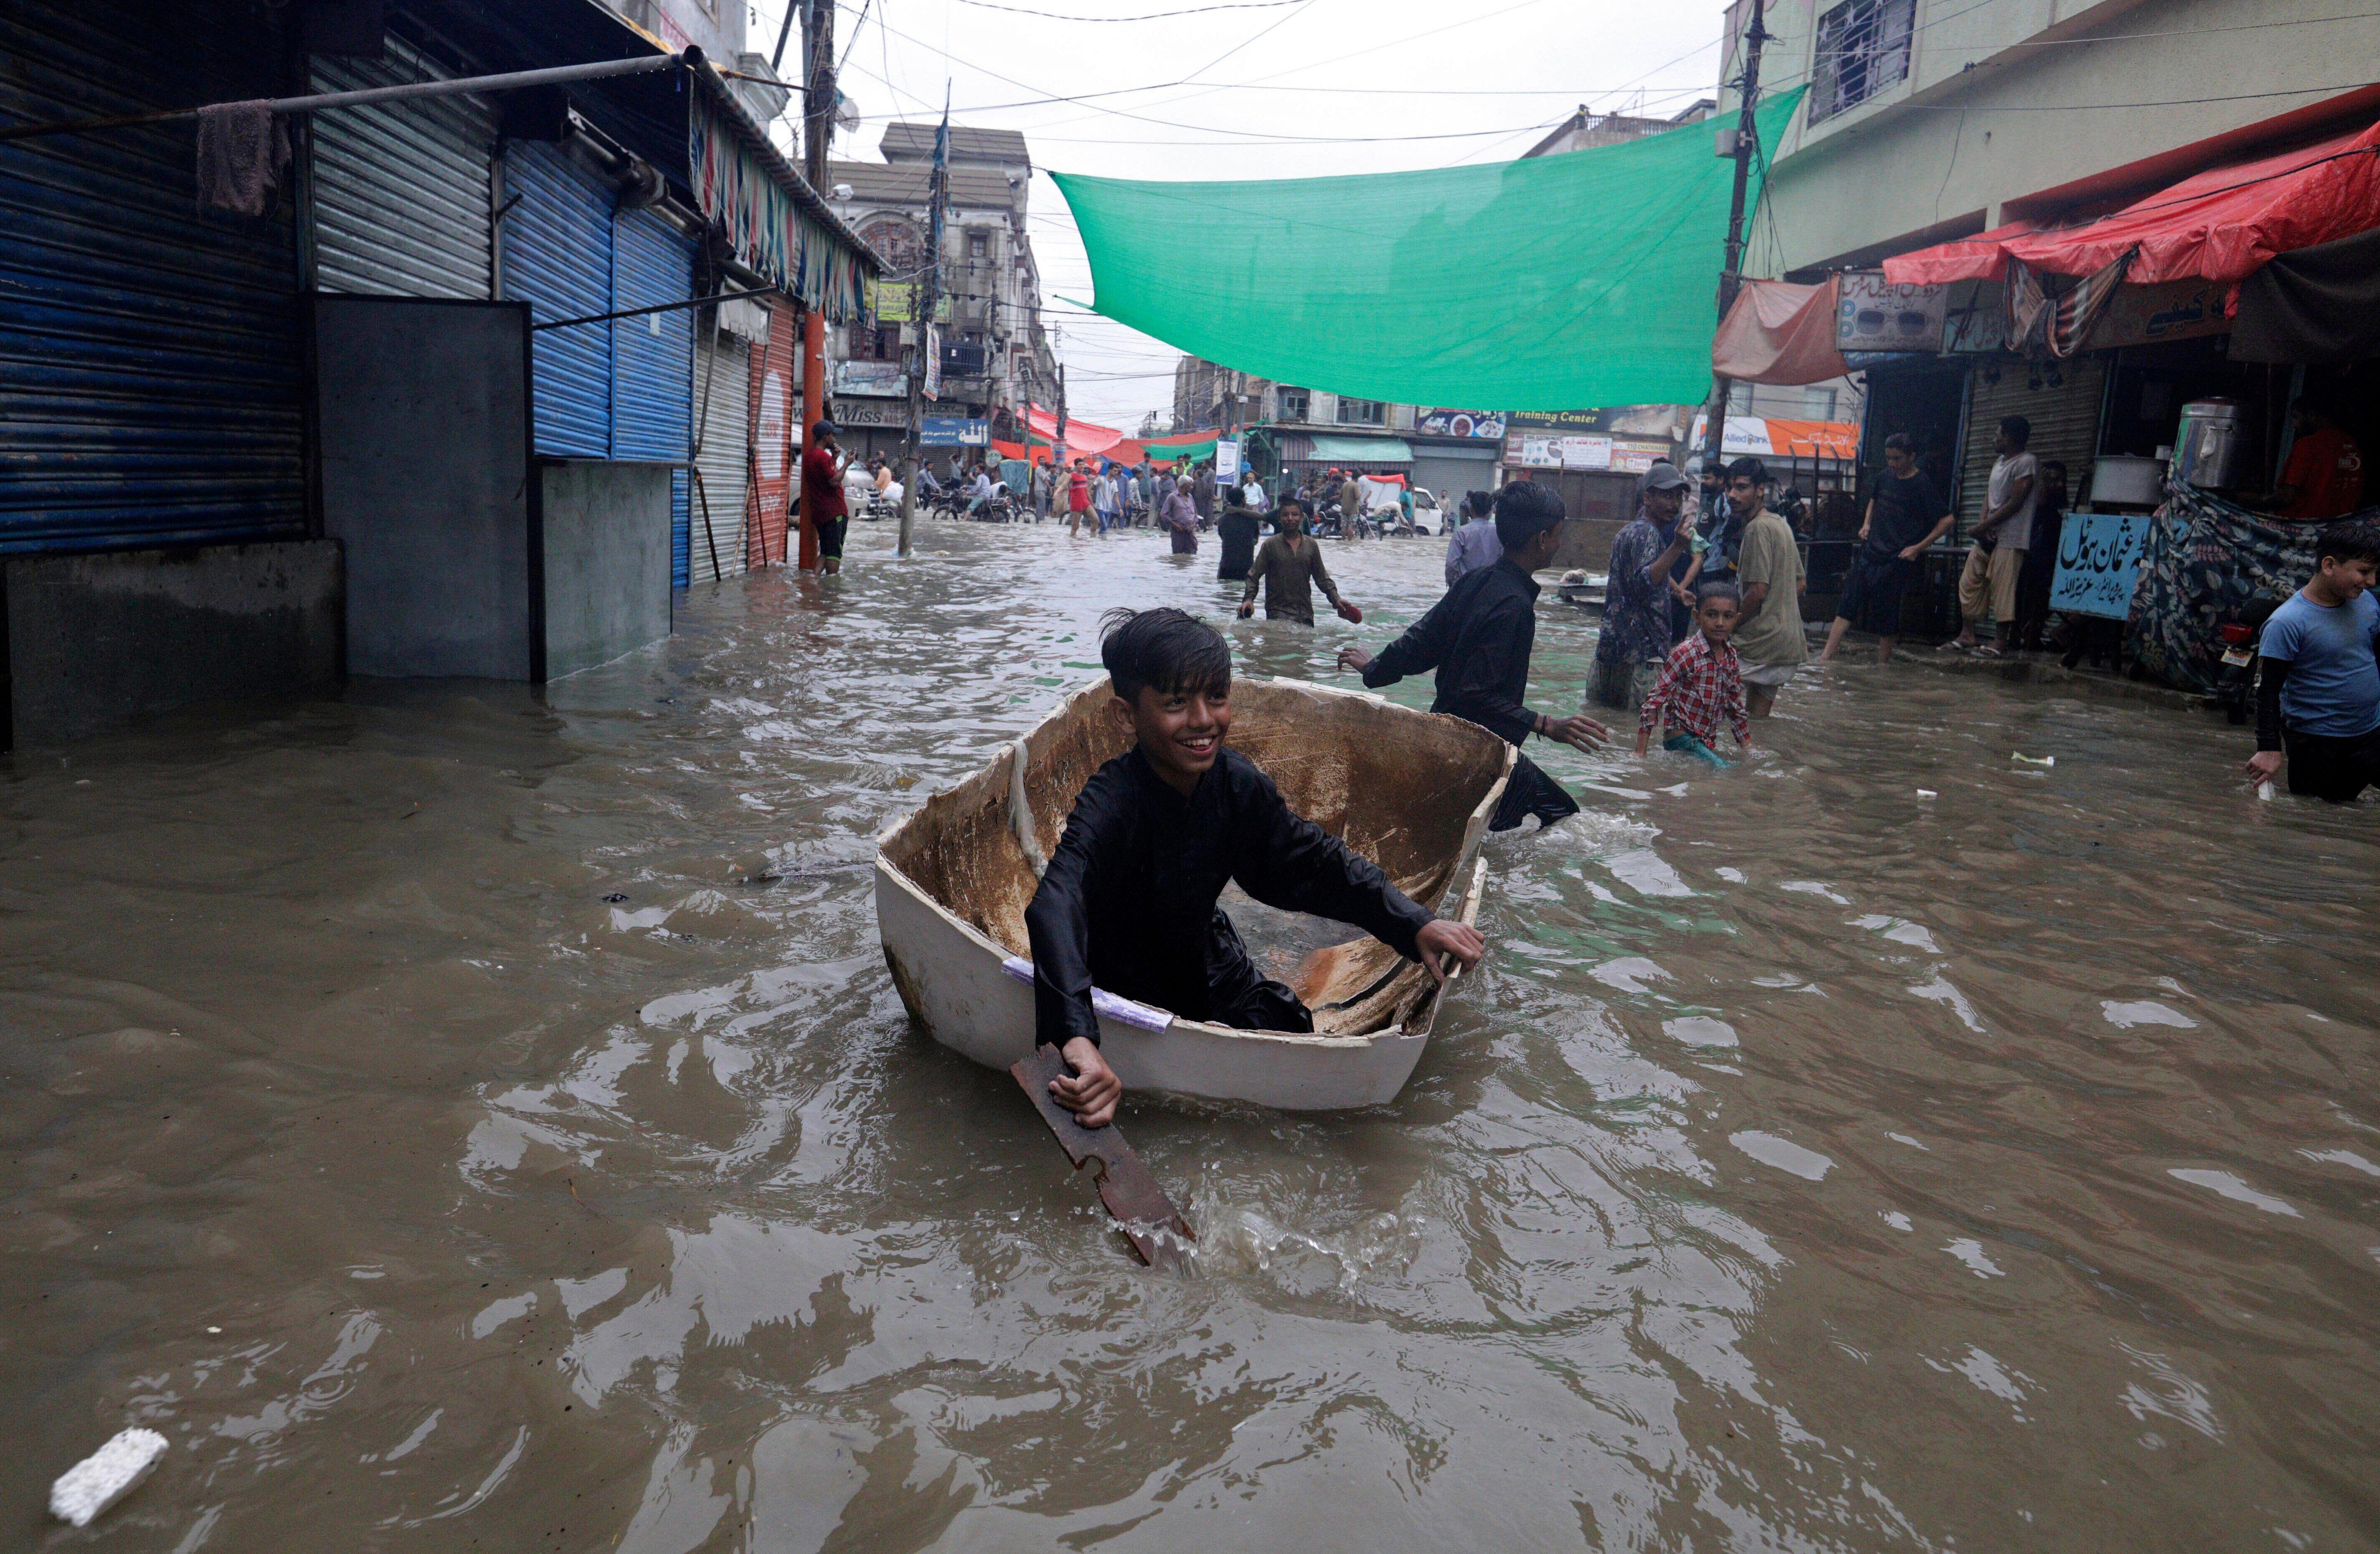 A boy uses half of a fiber tank to navigate a flooded street after heavy monsoon rains, in Karachi, Pakistan, Thursday, Aug.